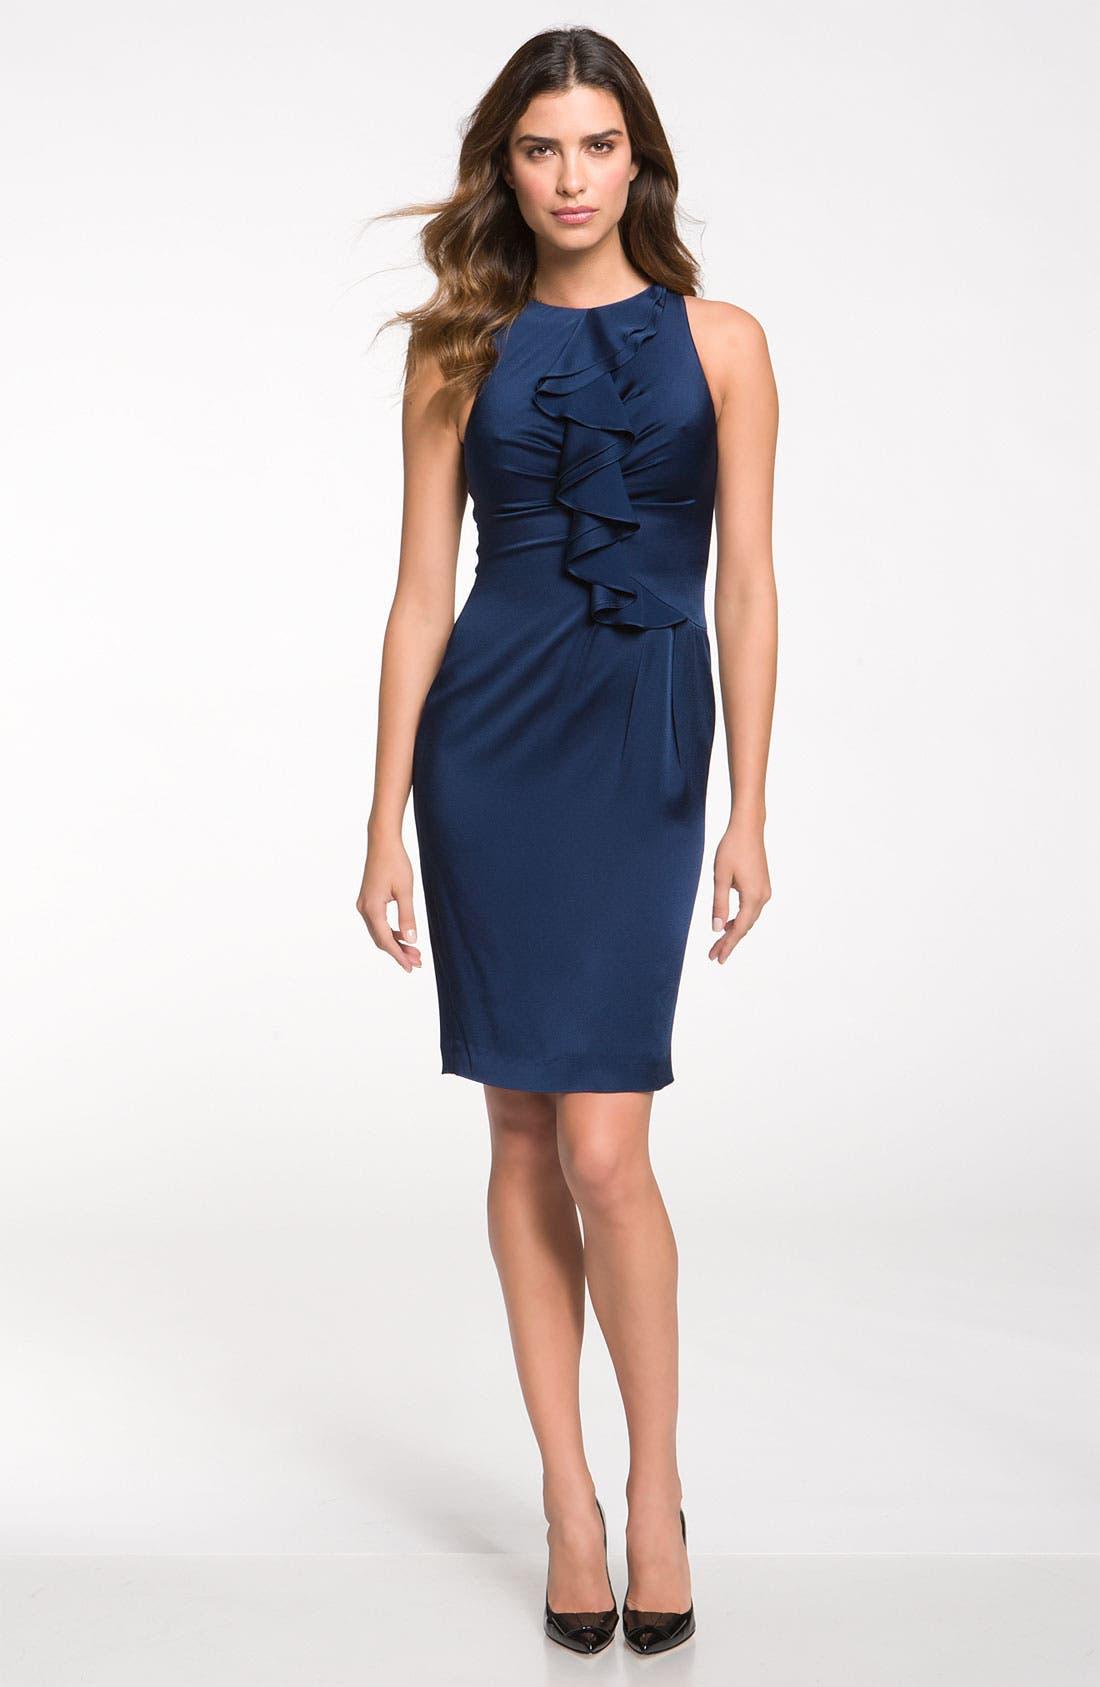 Alternate Image 1 Selected - St. John Collection Ruffle Satin Dress